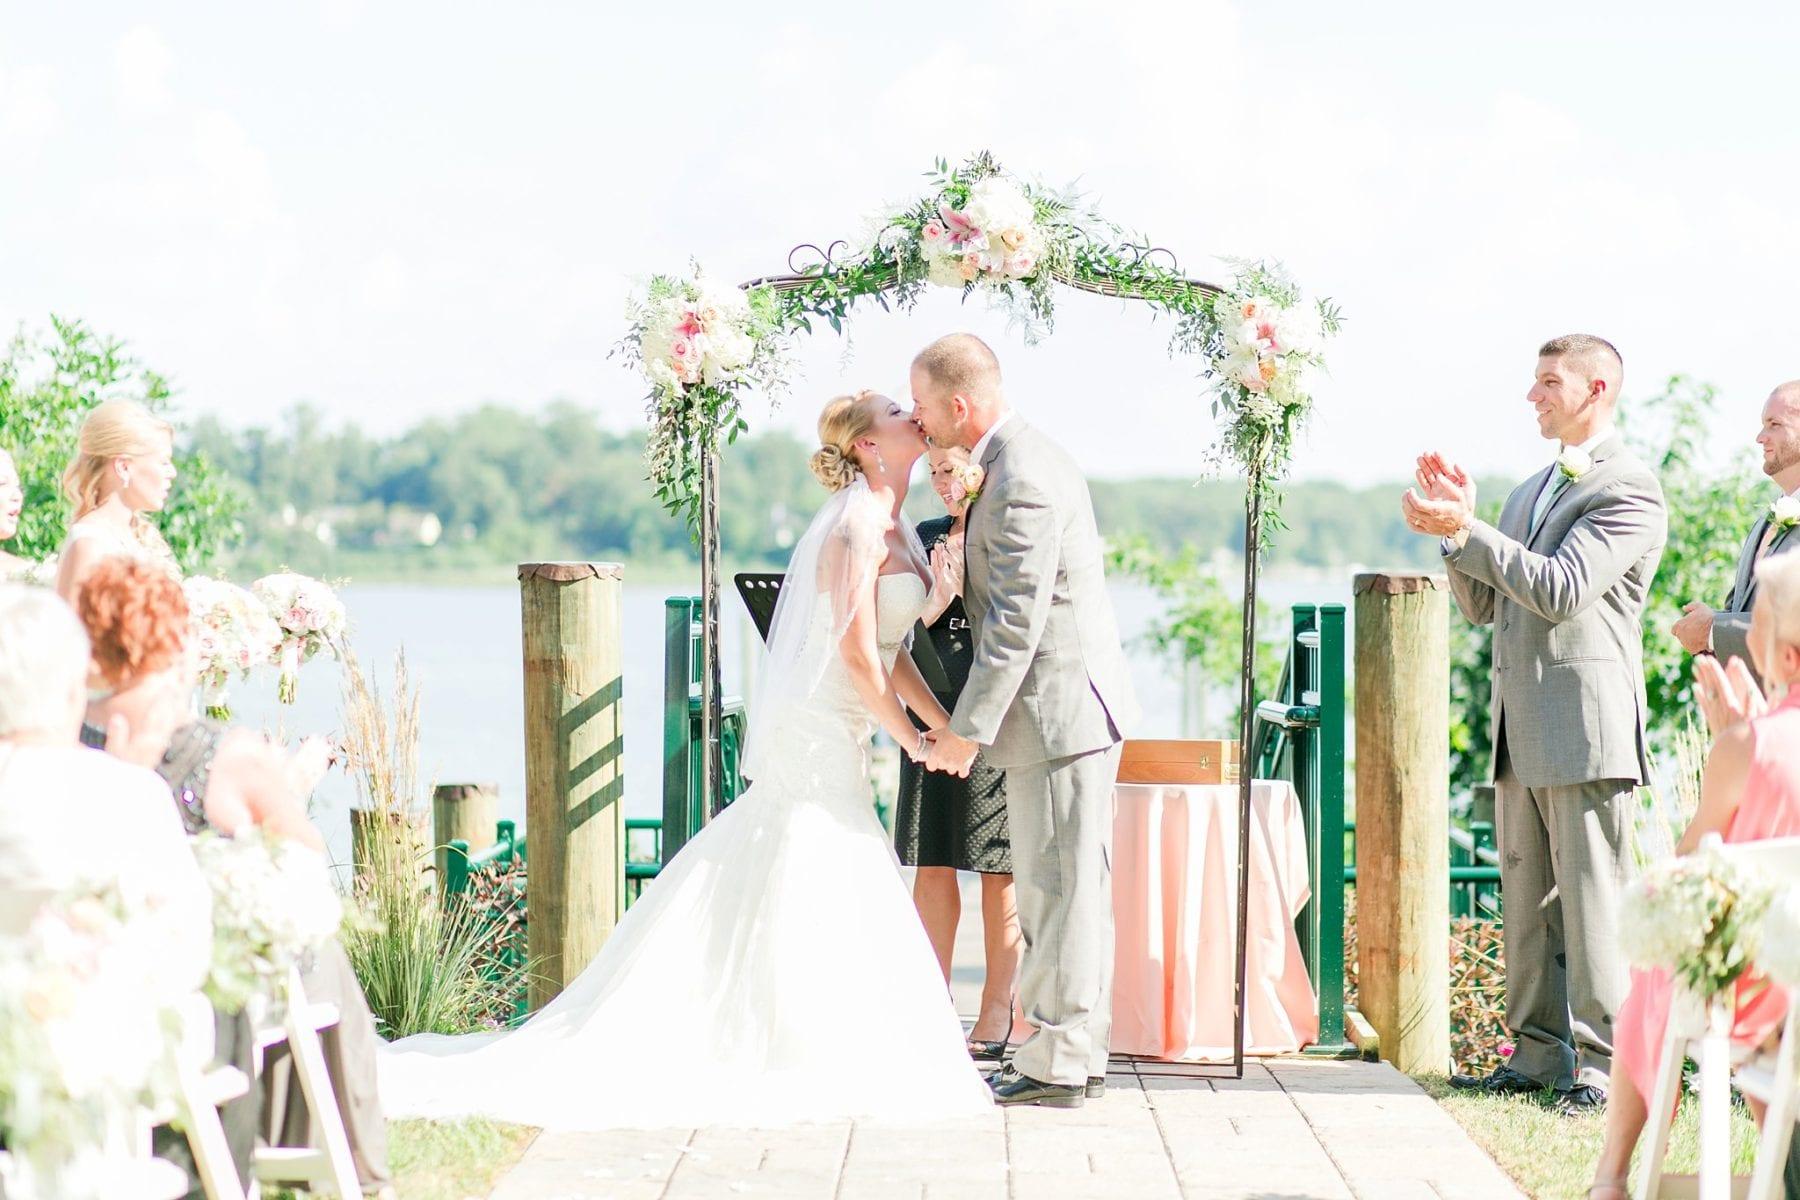 Waters Edge Wedding Photos Maryland Wedding Photographer Megan Kelsey Photography Katie & Conor-226.JPG